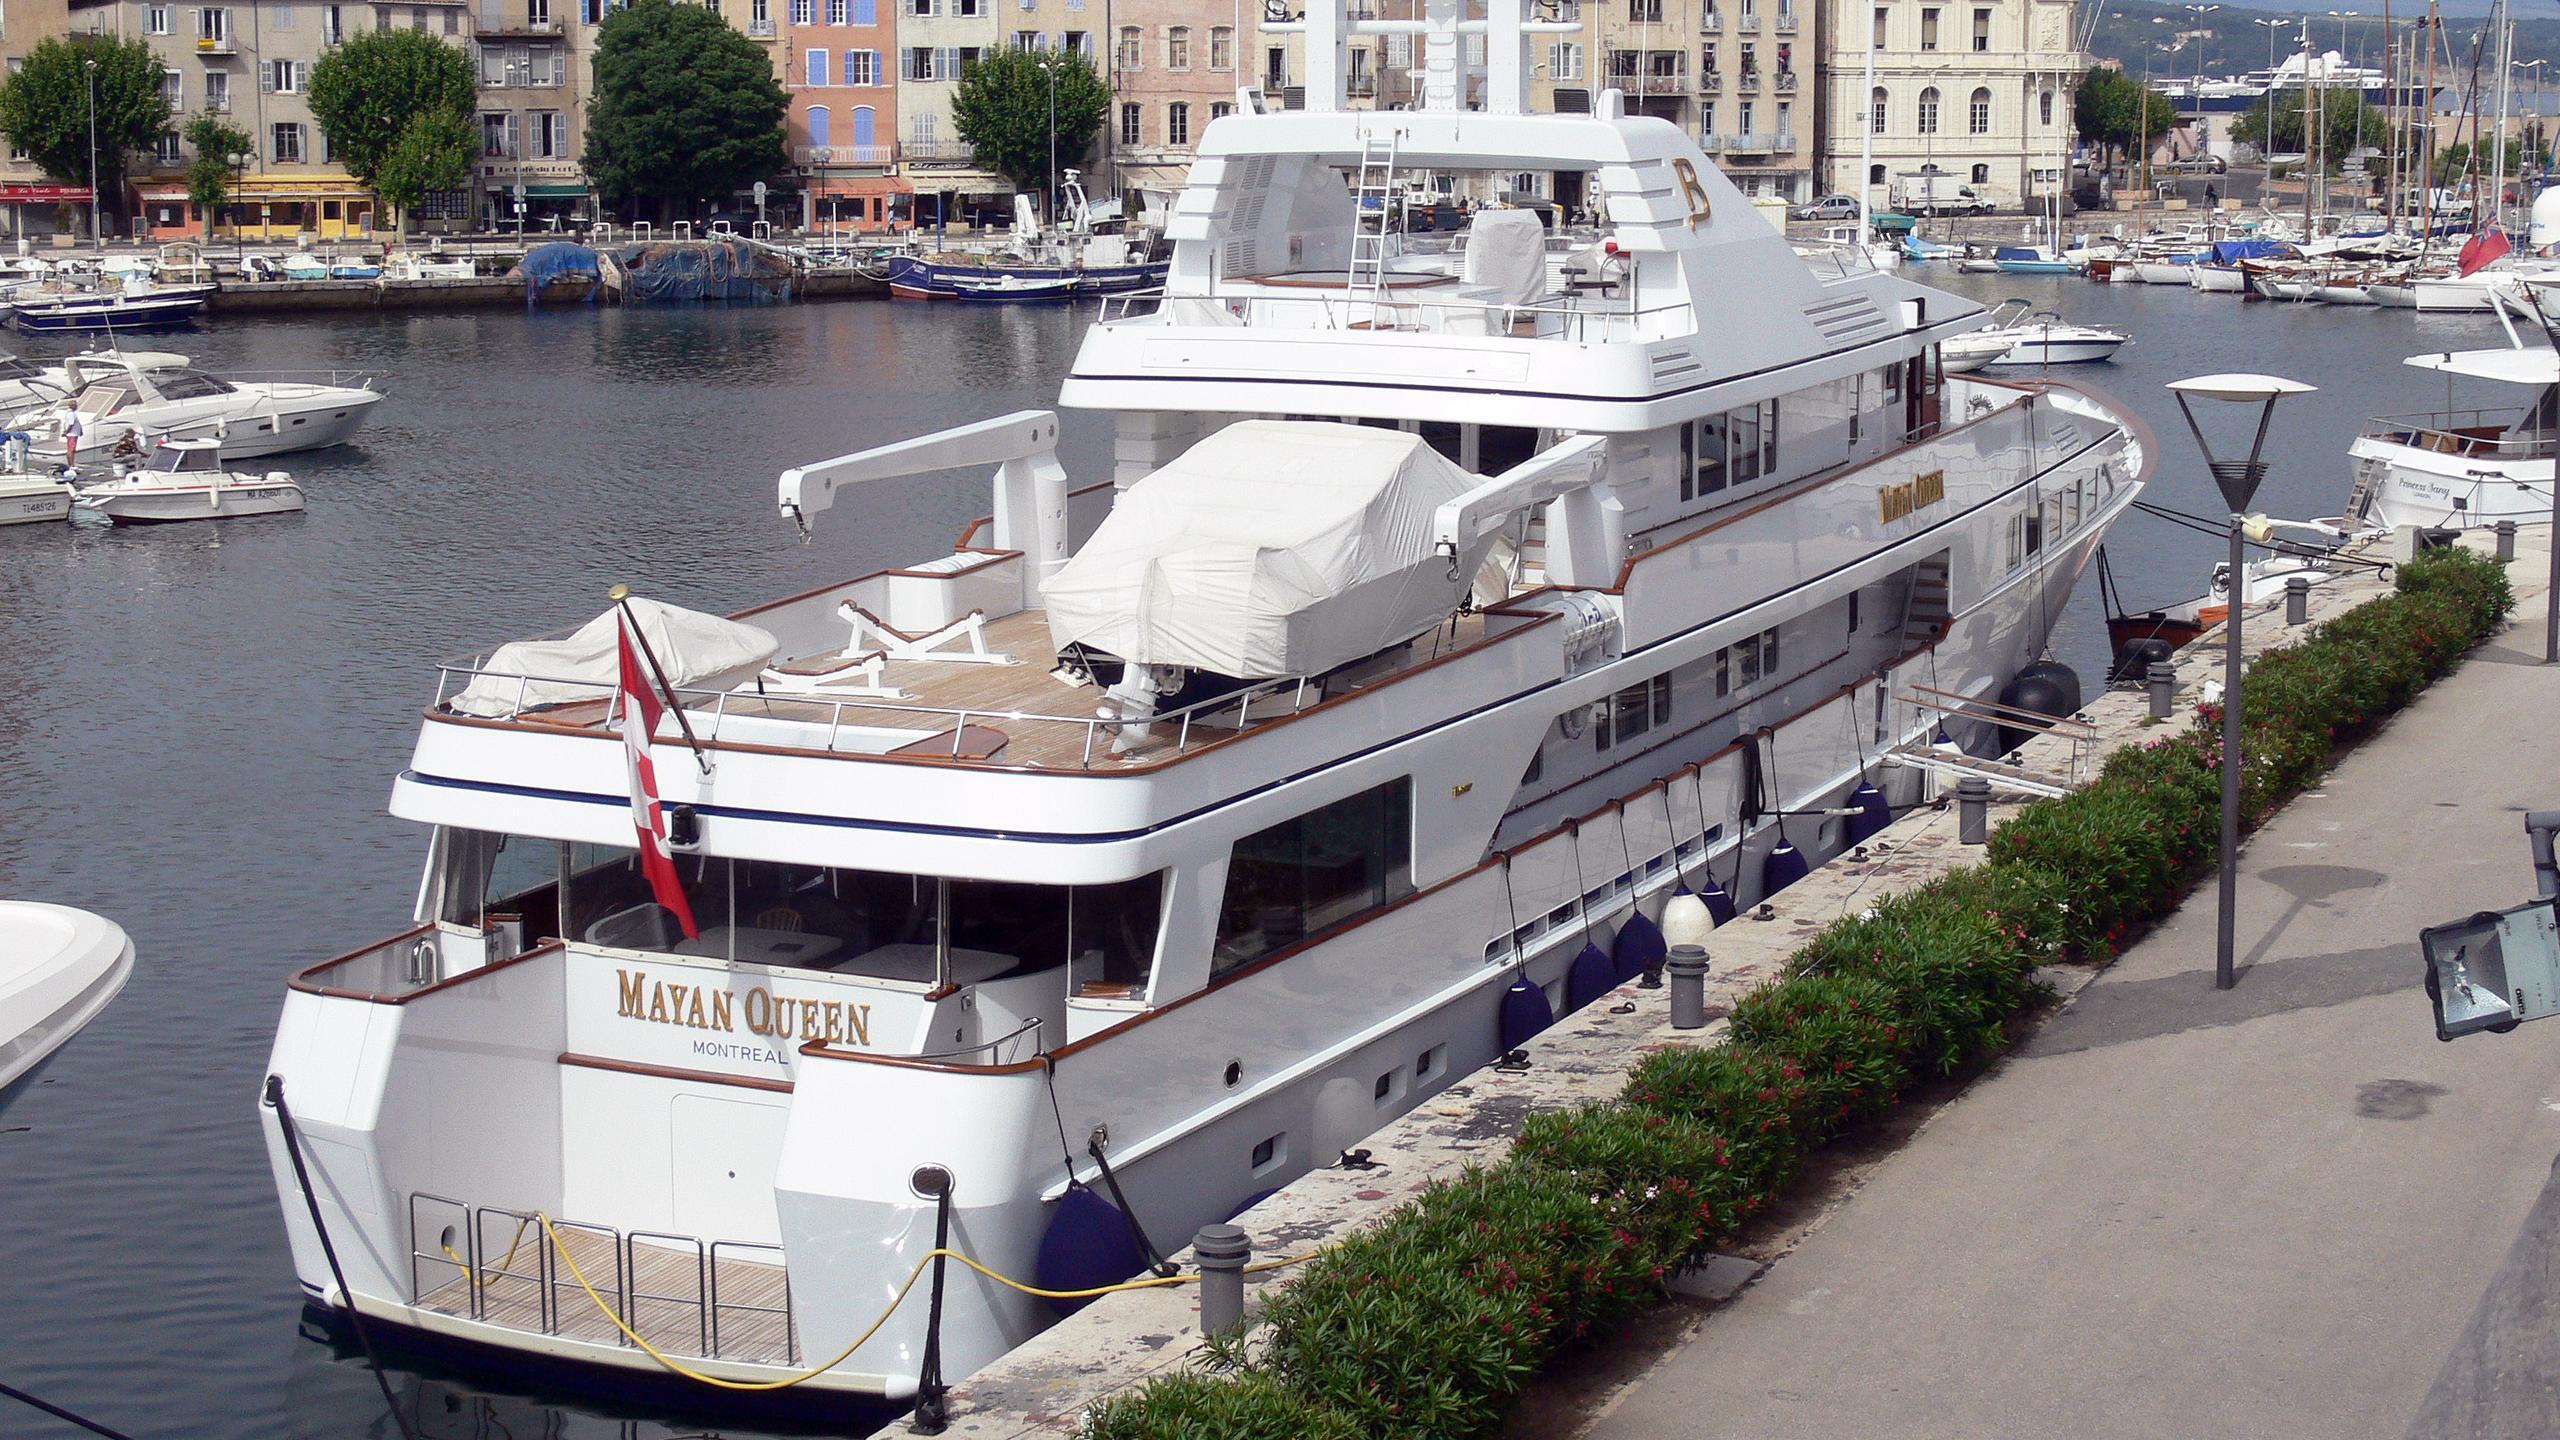 mq2-motor-yacht-fedship-1990-49m-stern